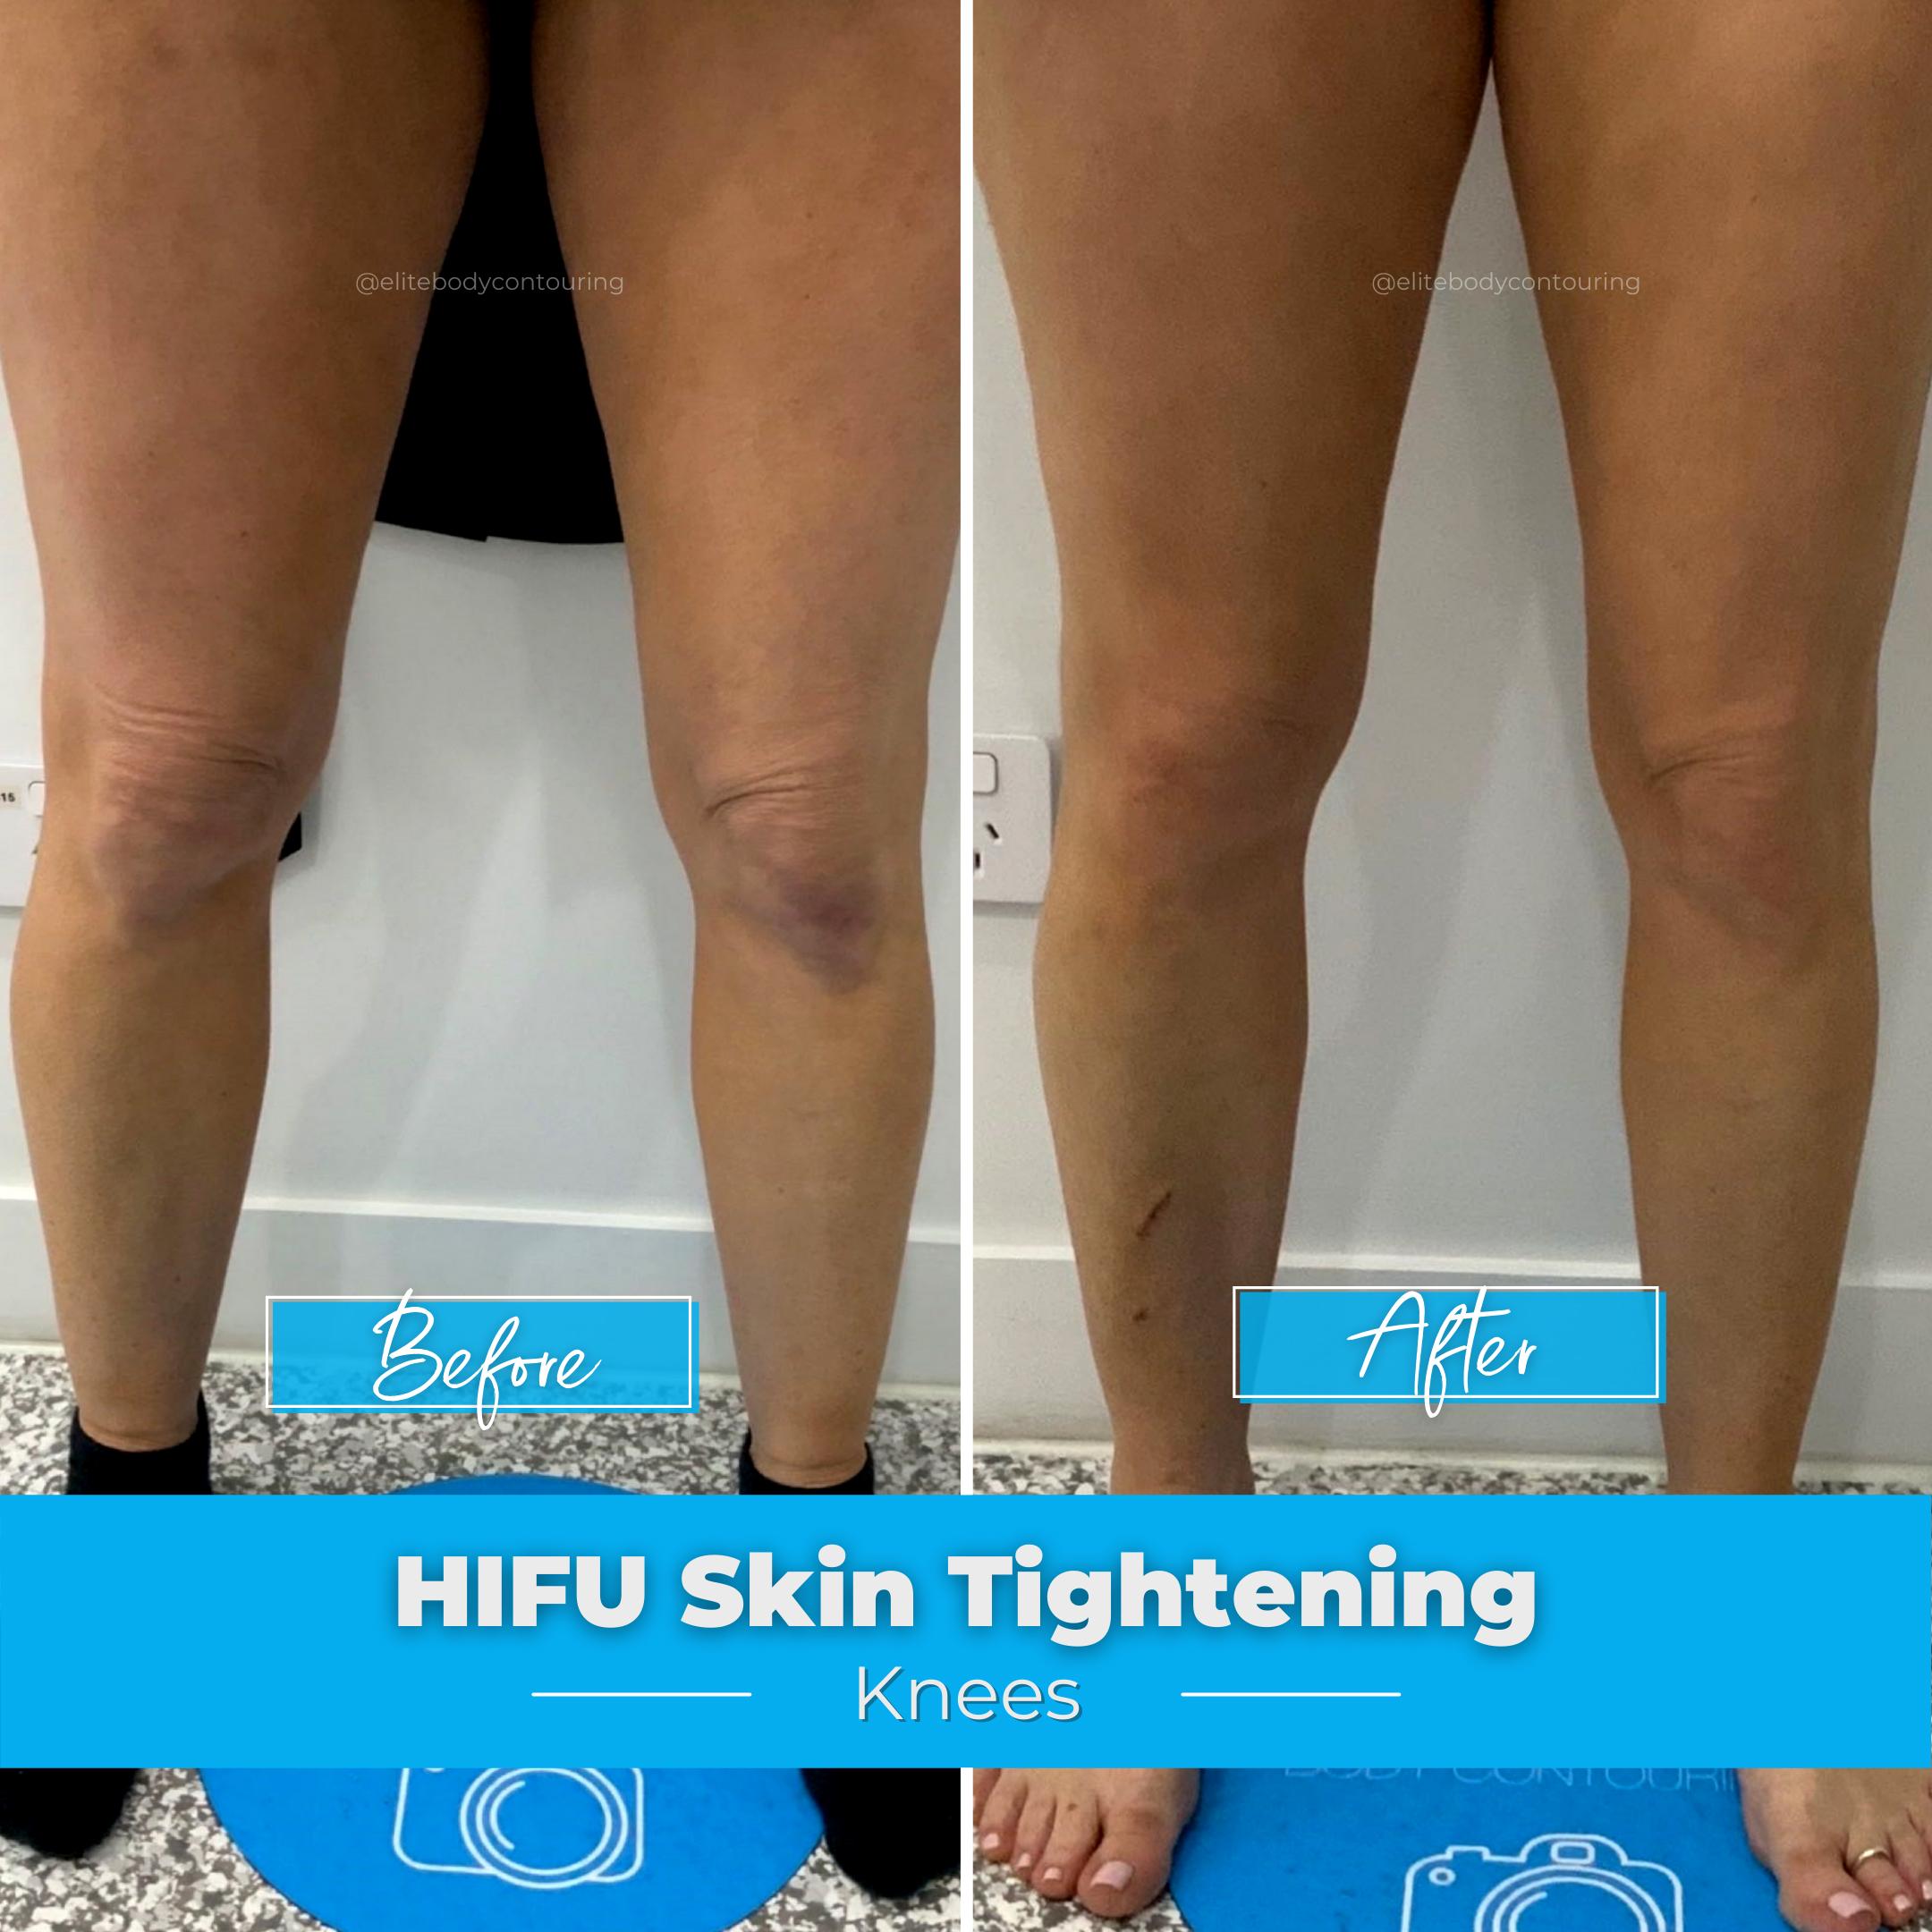 HIFU Skin Tightening - Knees